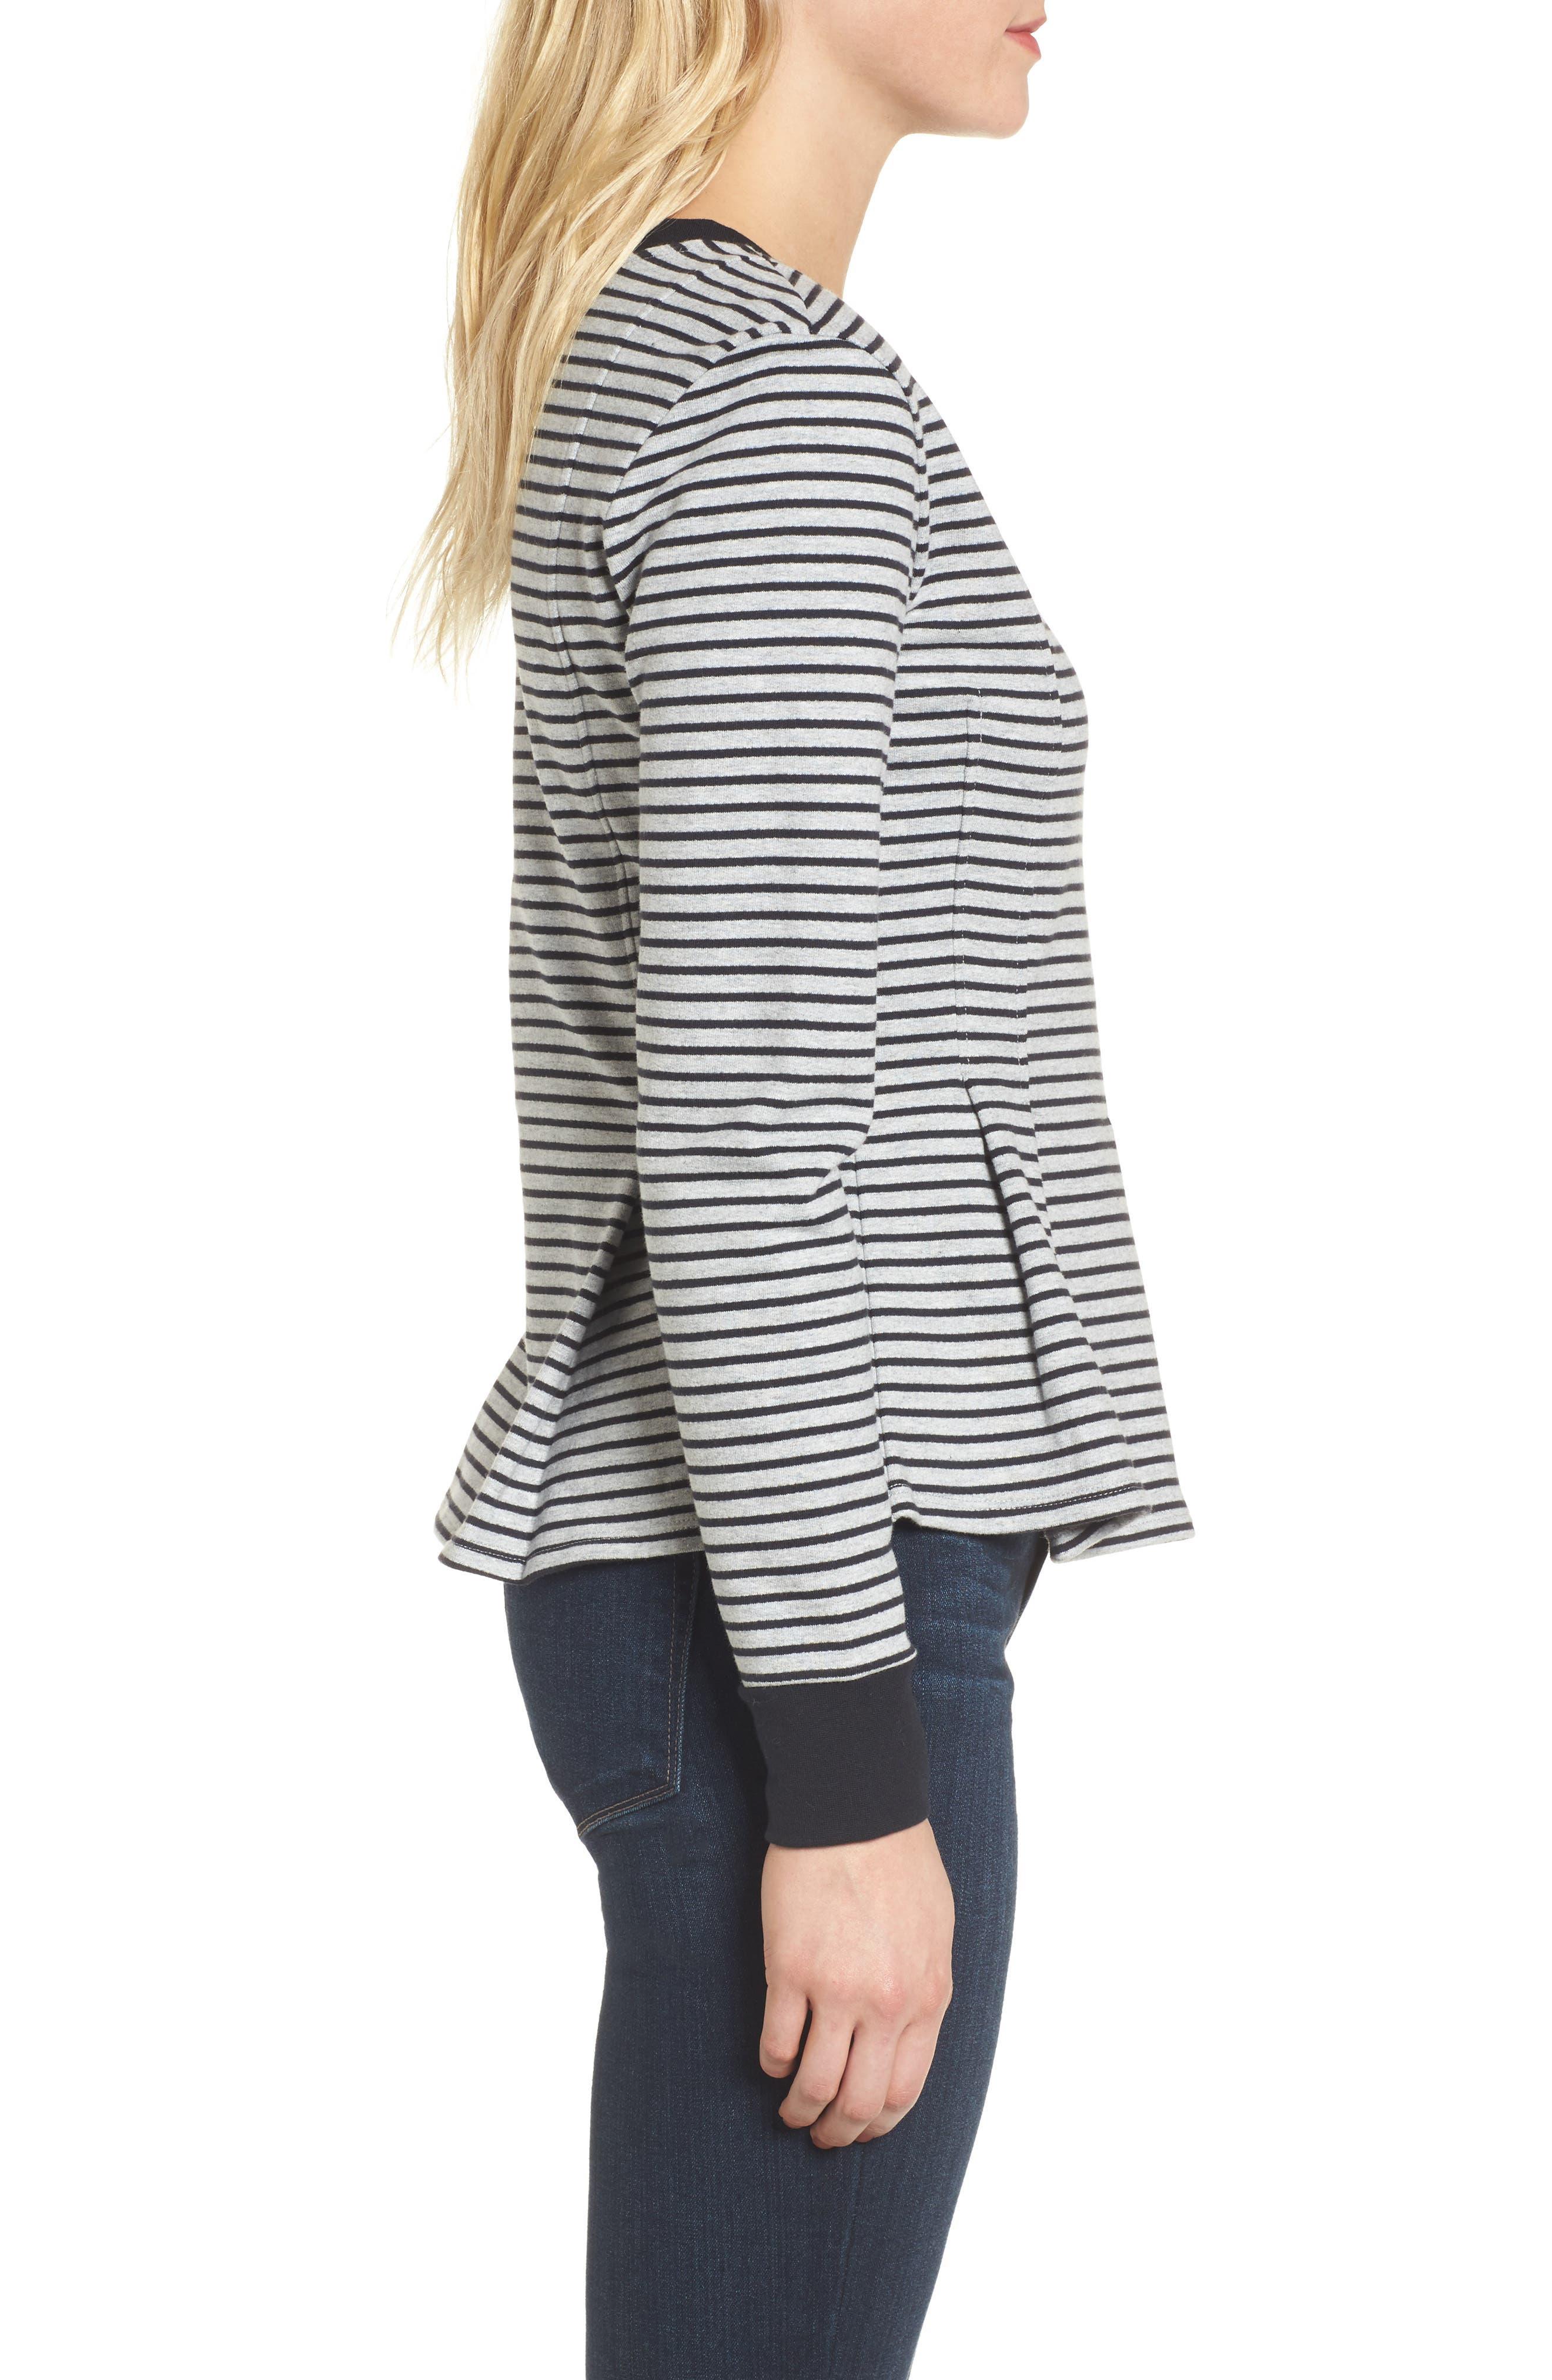 Pleated Sweatshirt,                             Alternate thumbnail 3, color,                             Grey Heather- Navy Seam Stripe